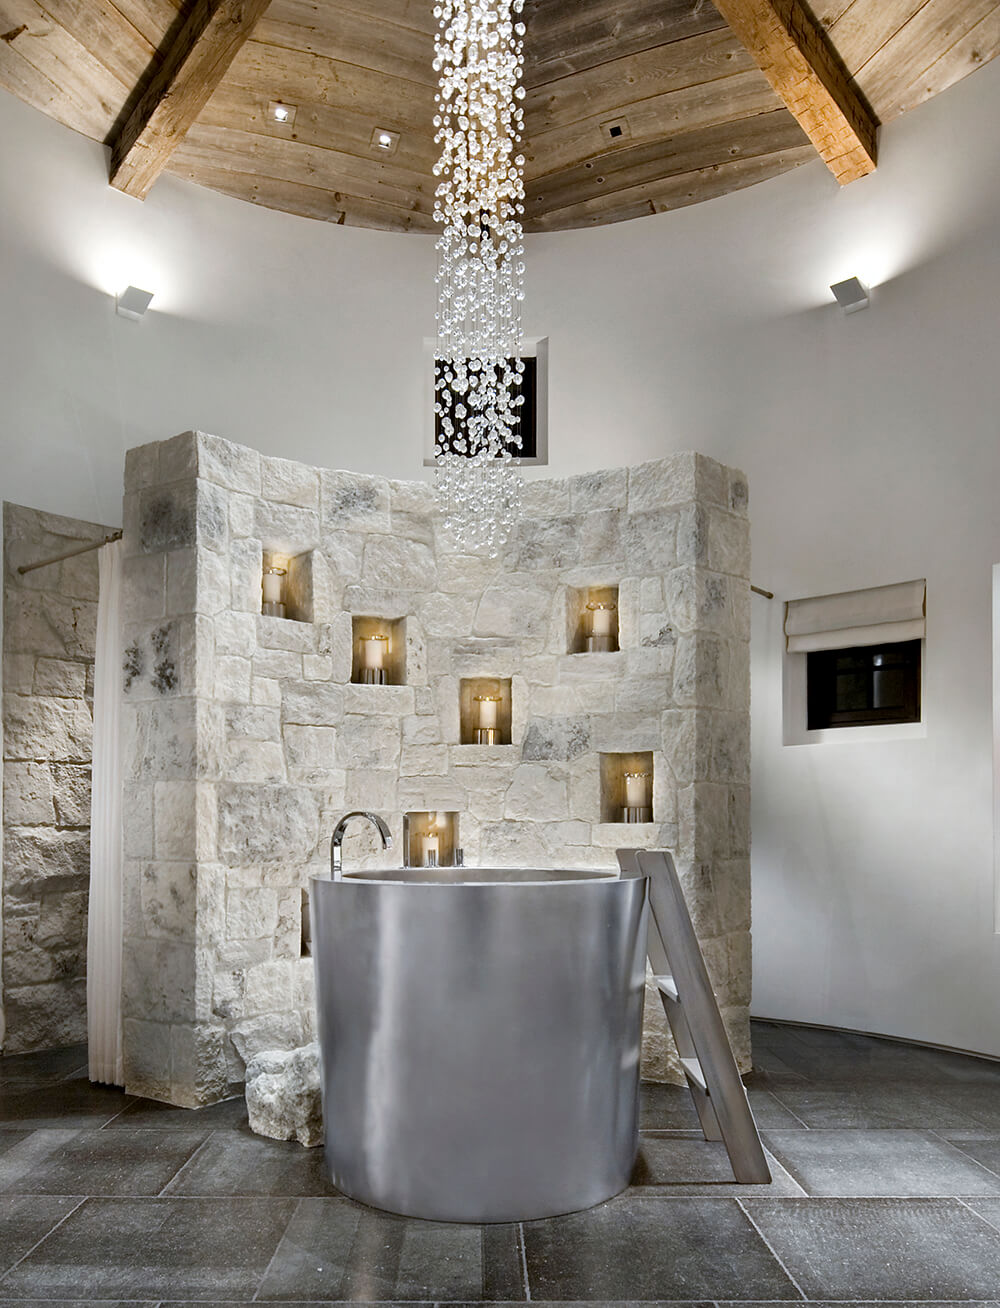 Japanese Soaking Tubs Baths Outdoor Soaking Tub